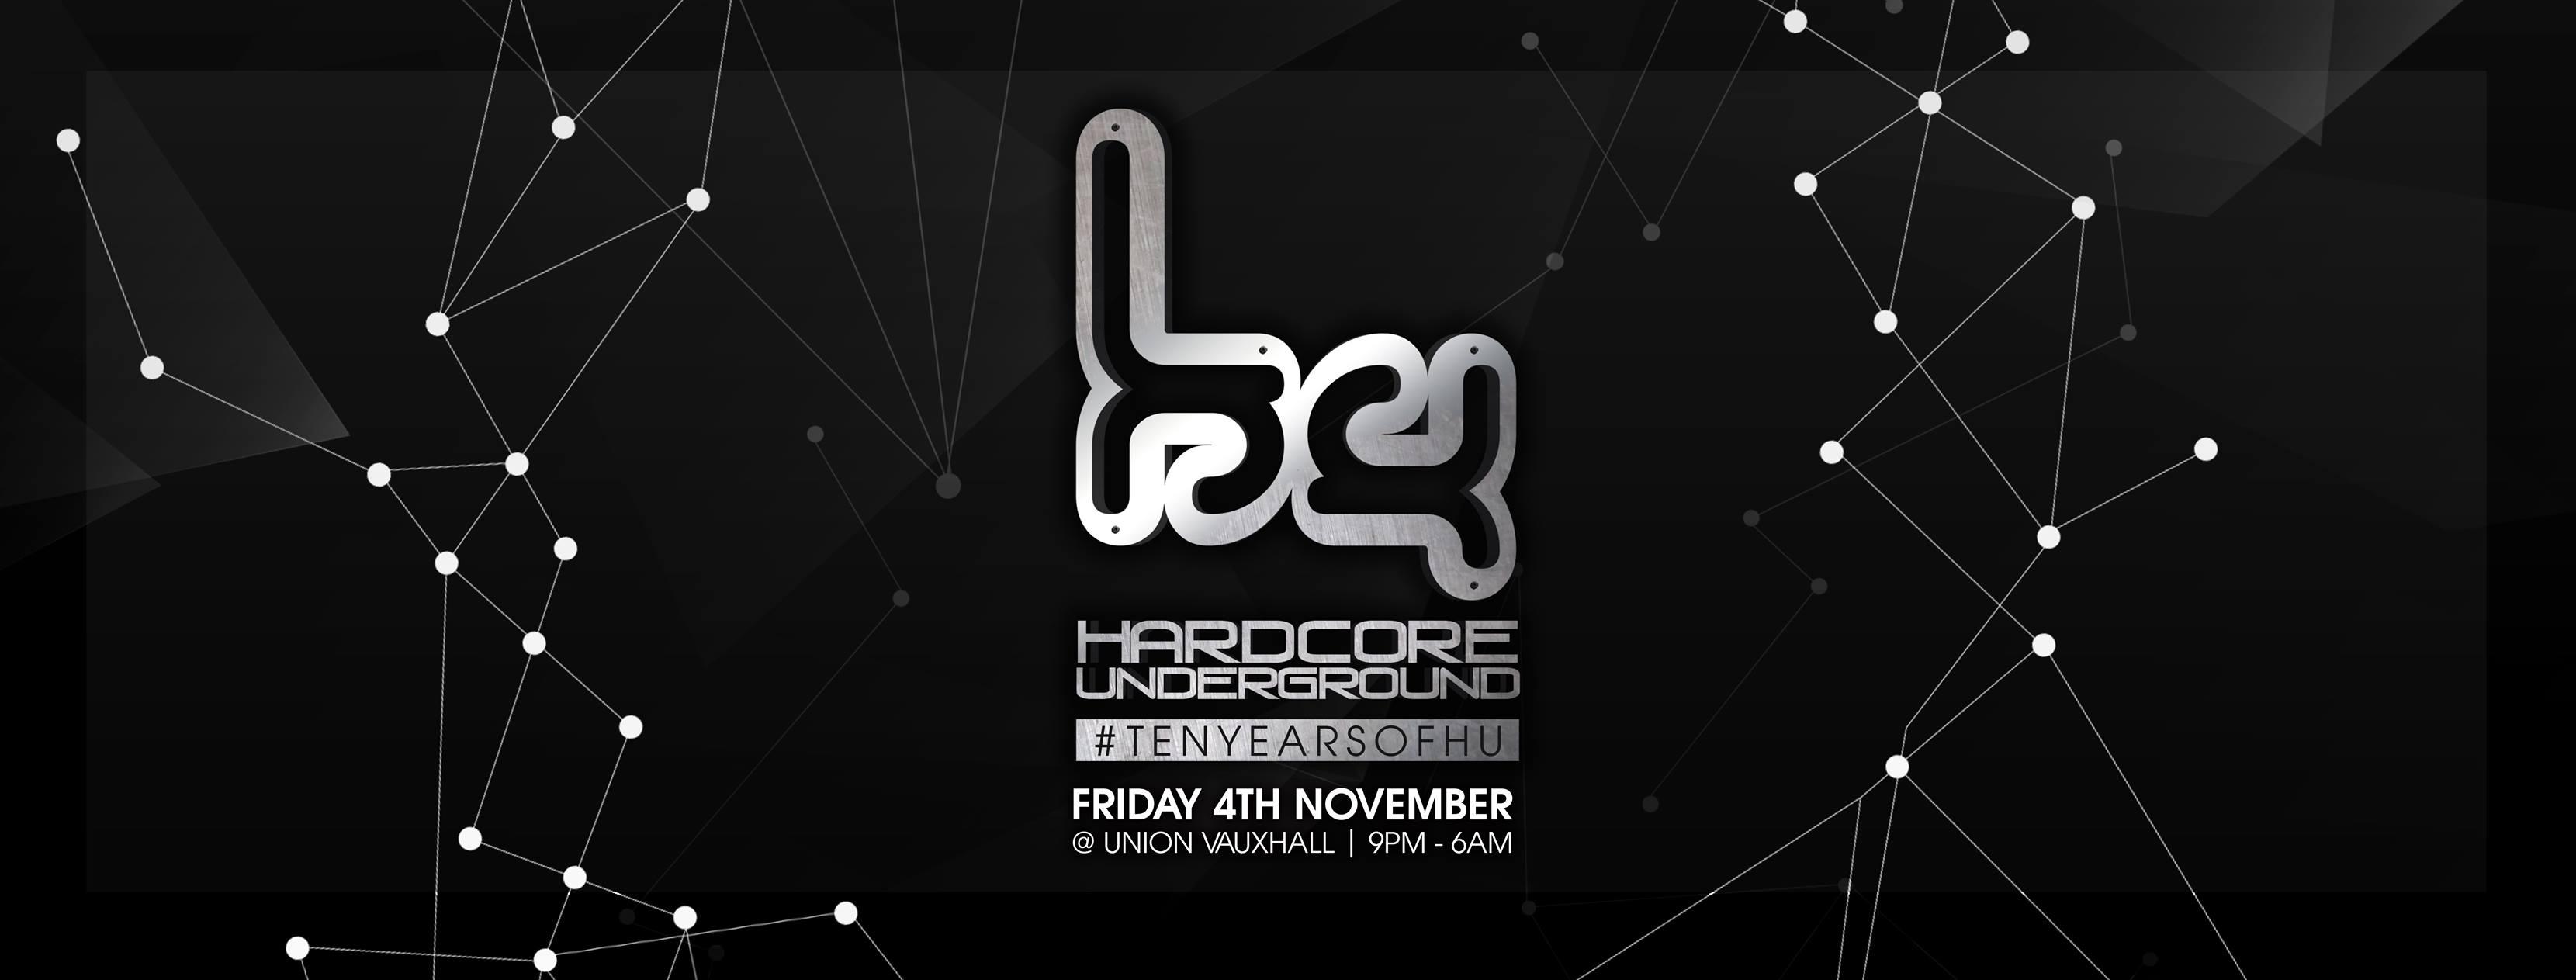 Hardcore Underground – 10th Birthday